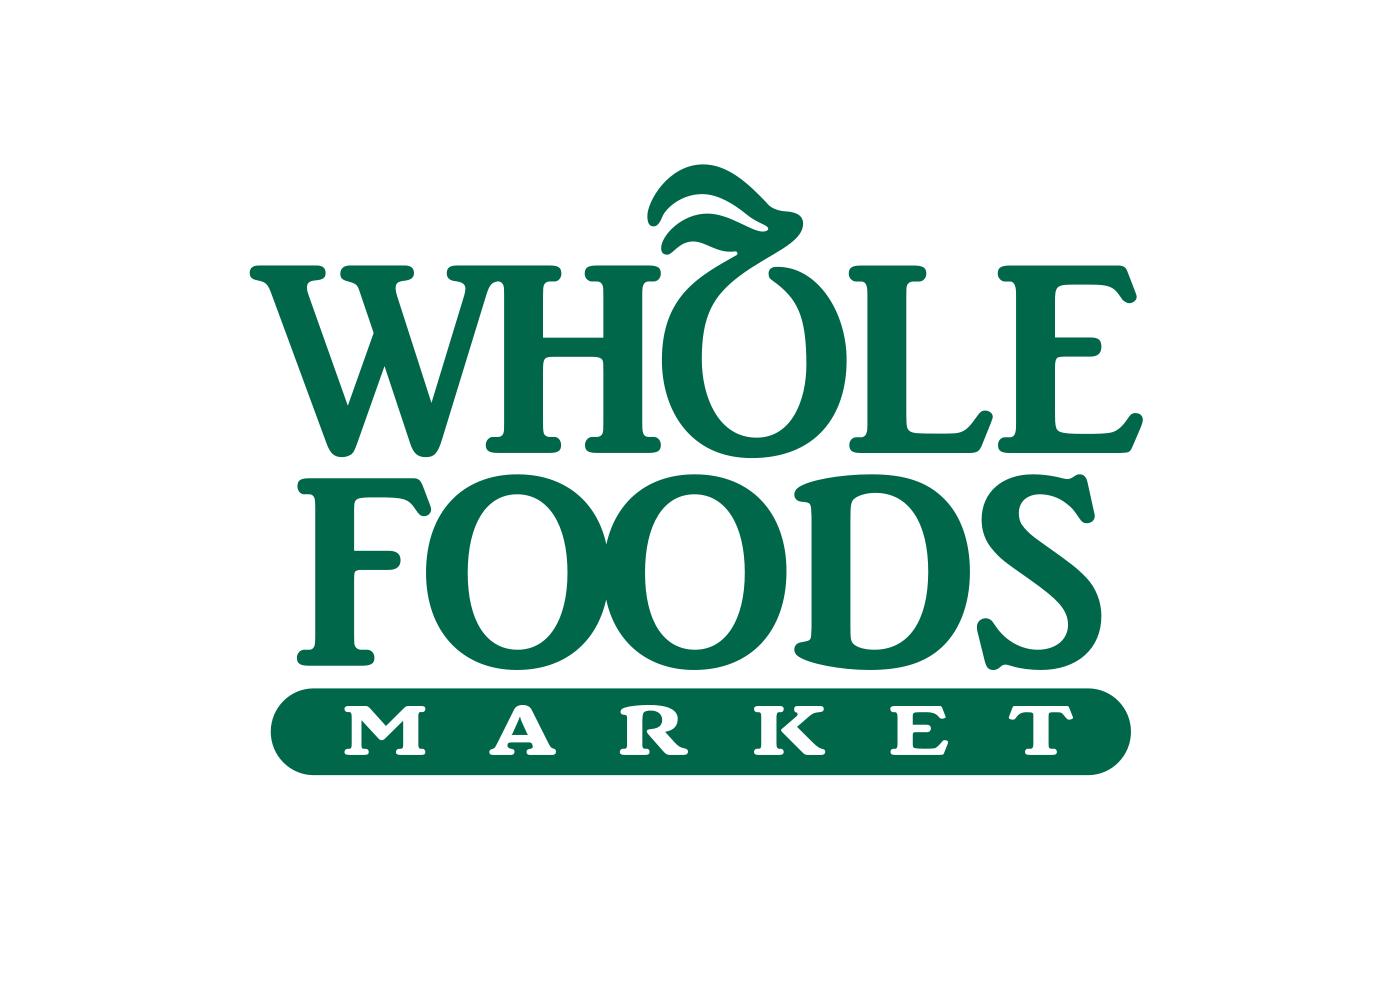 Whole Foods Market Logo 2008 Png